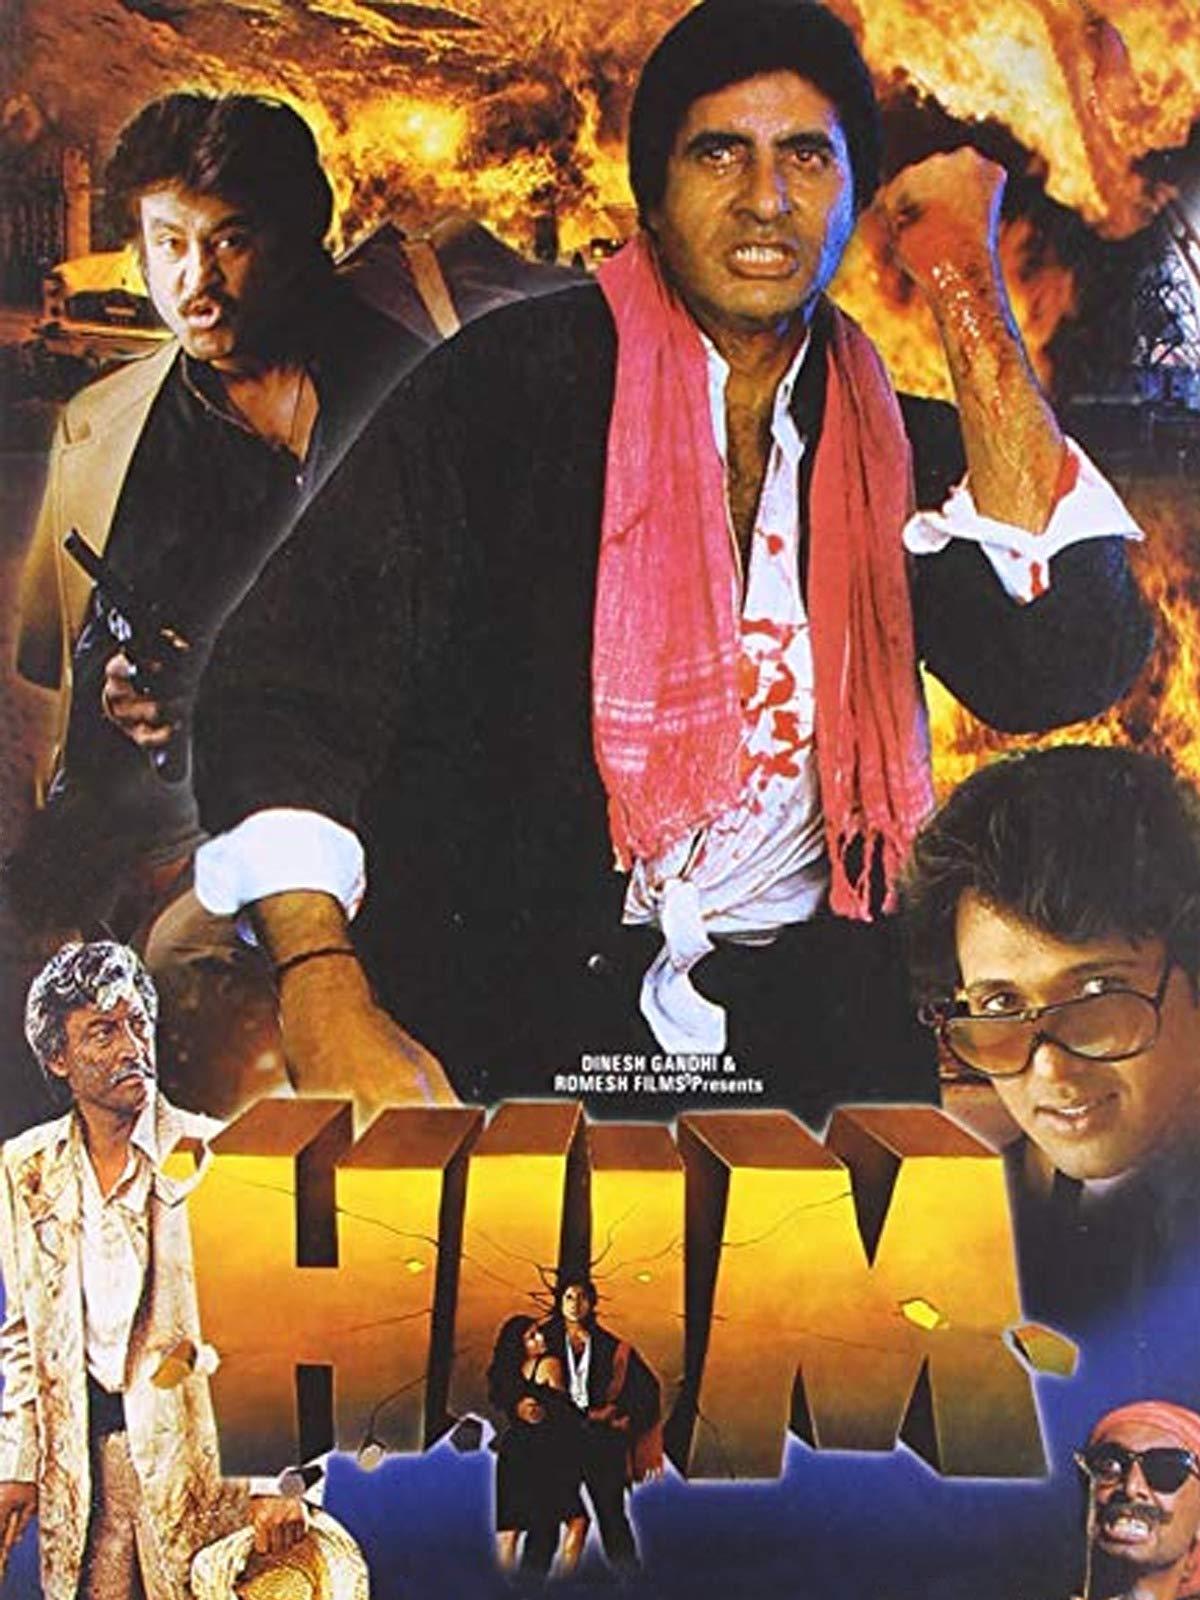 Hum 1991 Hindi 720p HEVC HDRip x265 AAC ESubs Full Bollywood Movie [850MB]